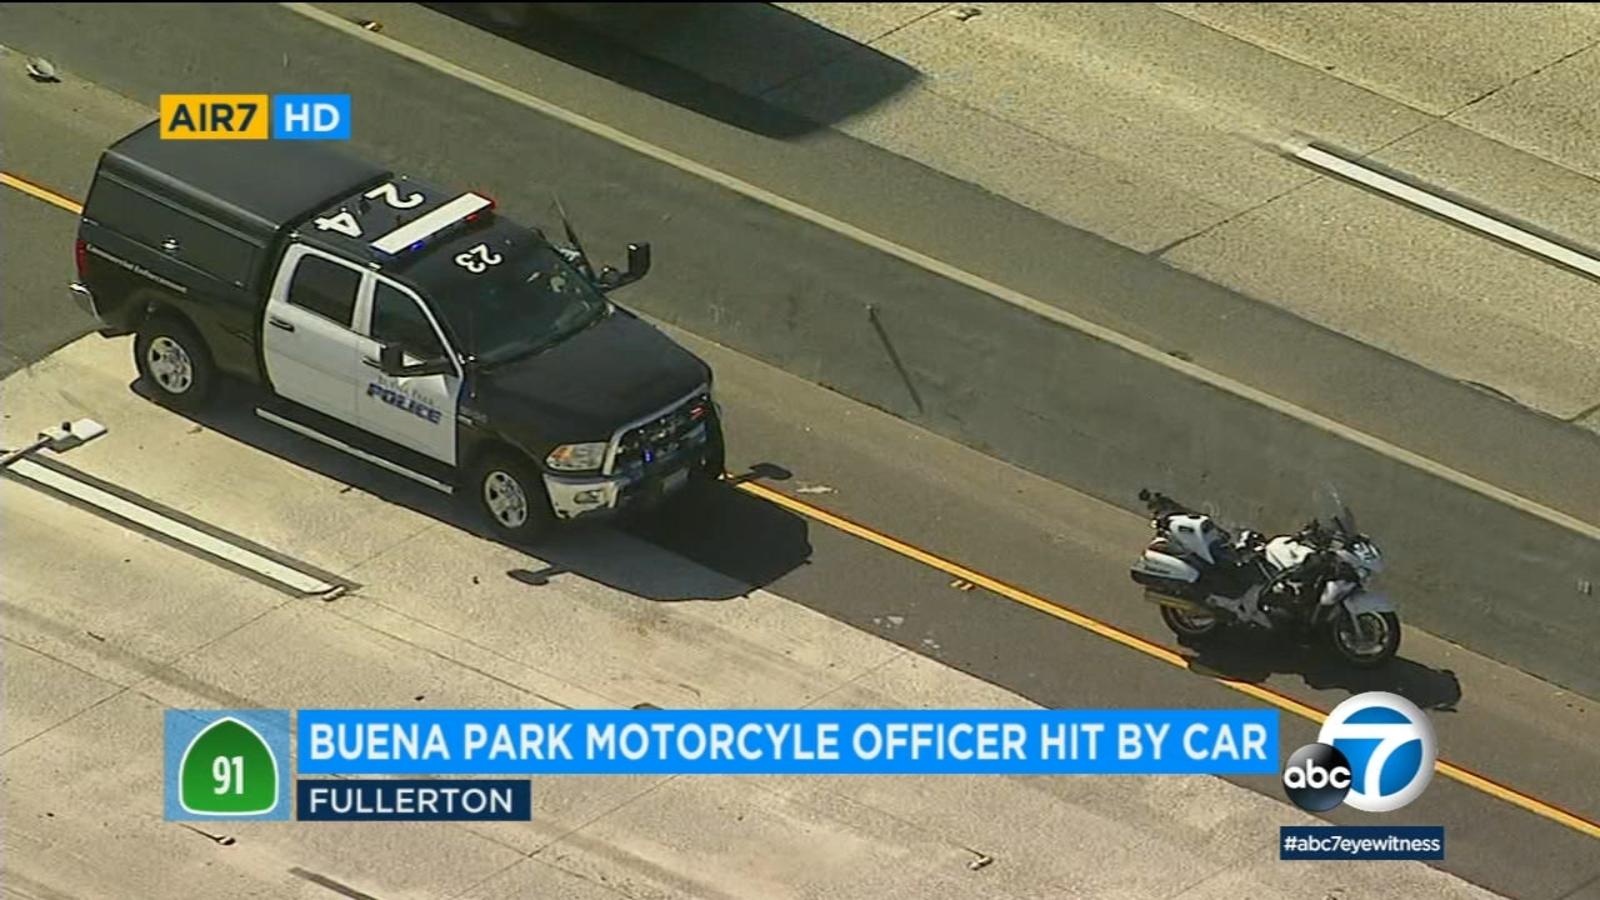 Buena Park police motorcycle officer injured in crash on 91 Freeway